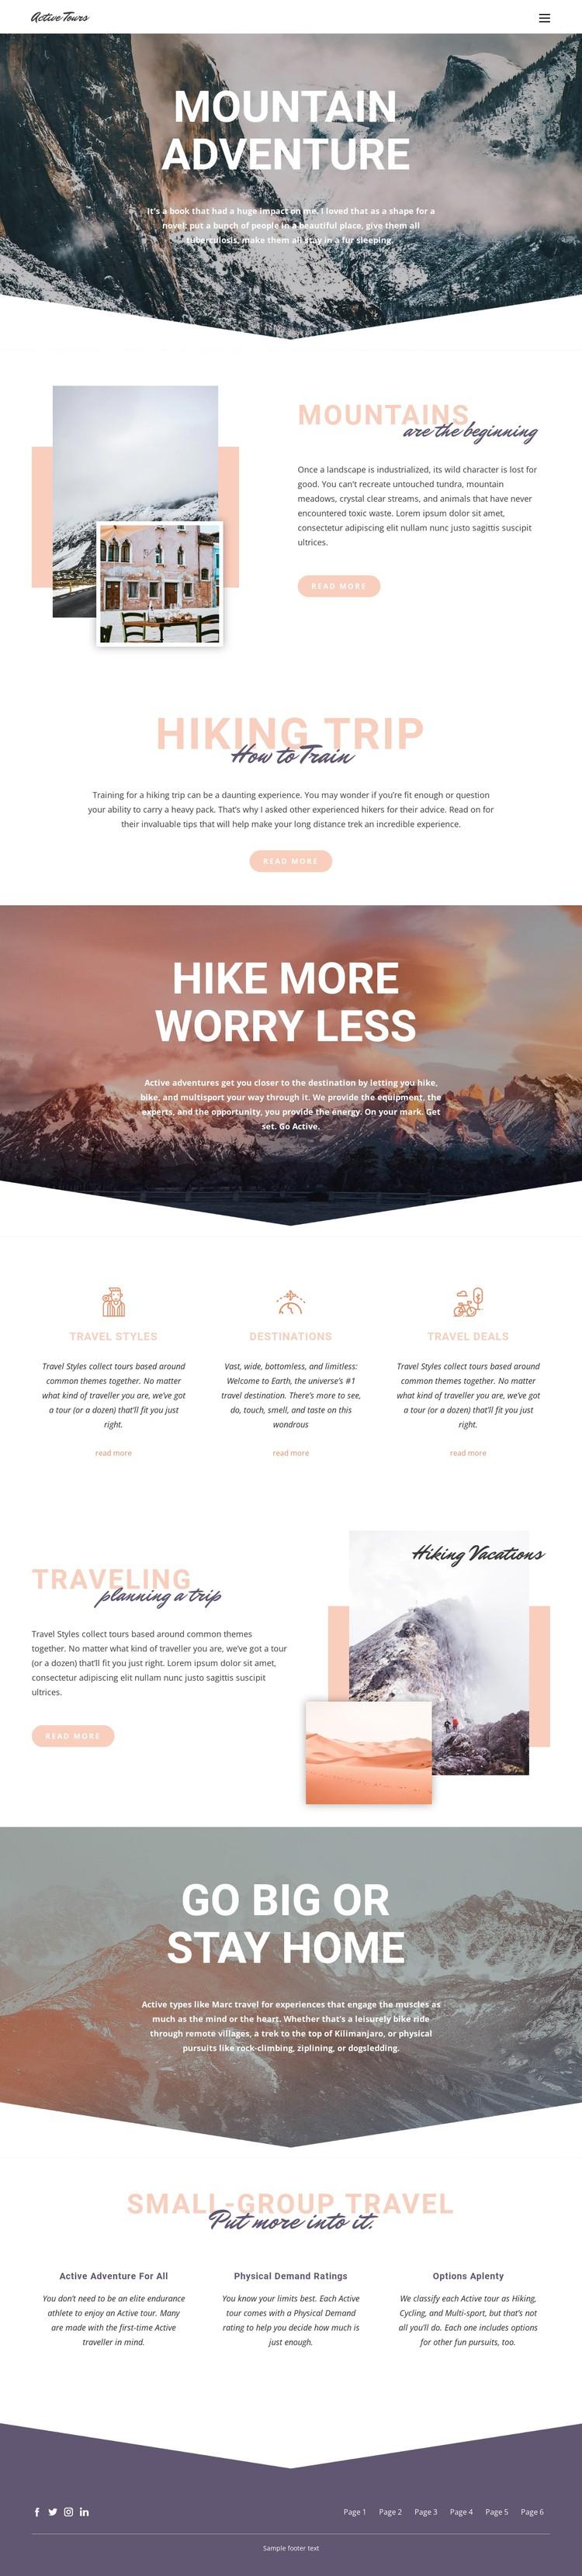 Mountain Adventure CSS Template